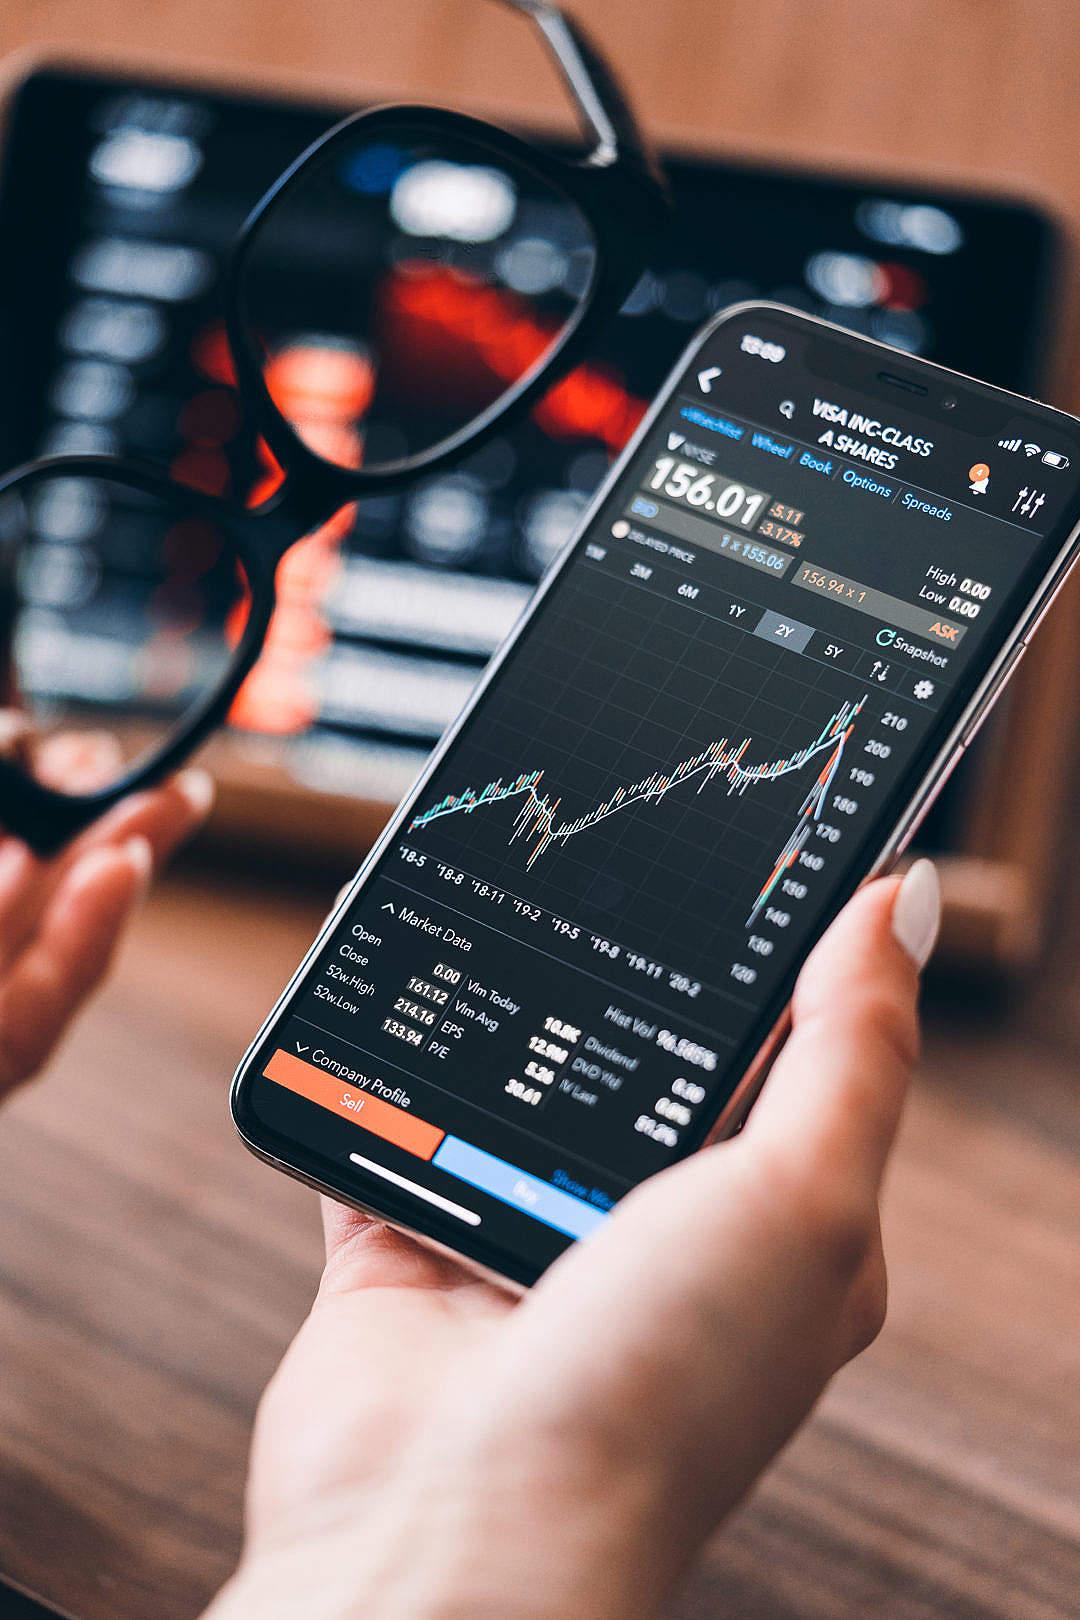 Download Blue Chip Stocks VISA Inc. Market Data FREE Stock Photo